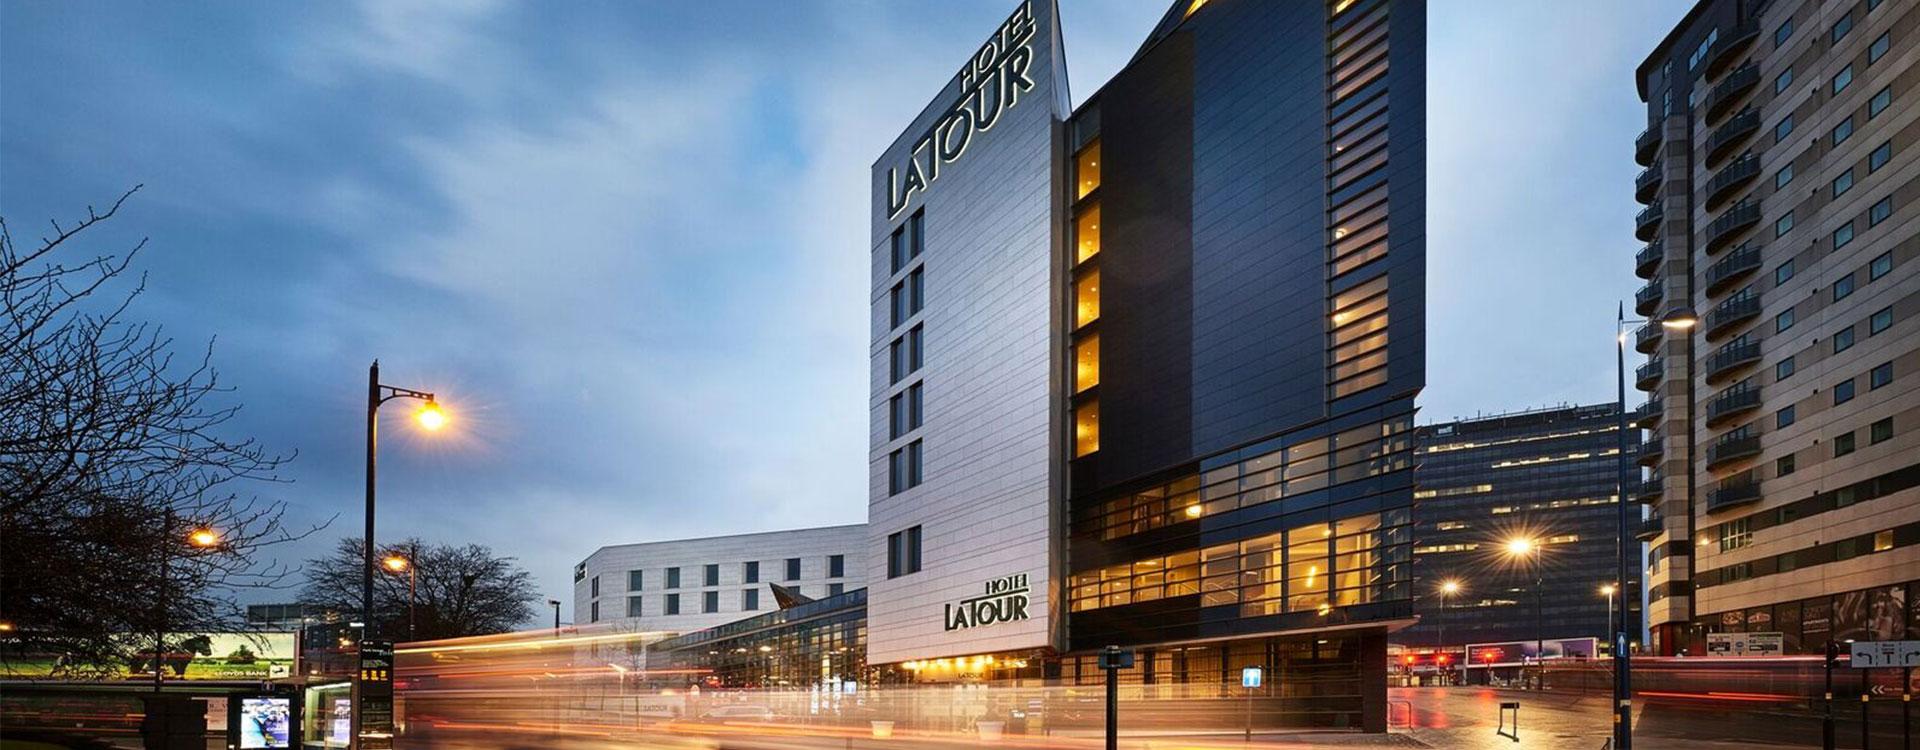 Dublin 39 s dalata to rebrand hotel la tour in birmingham for Hotels tours